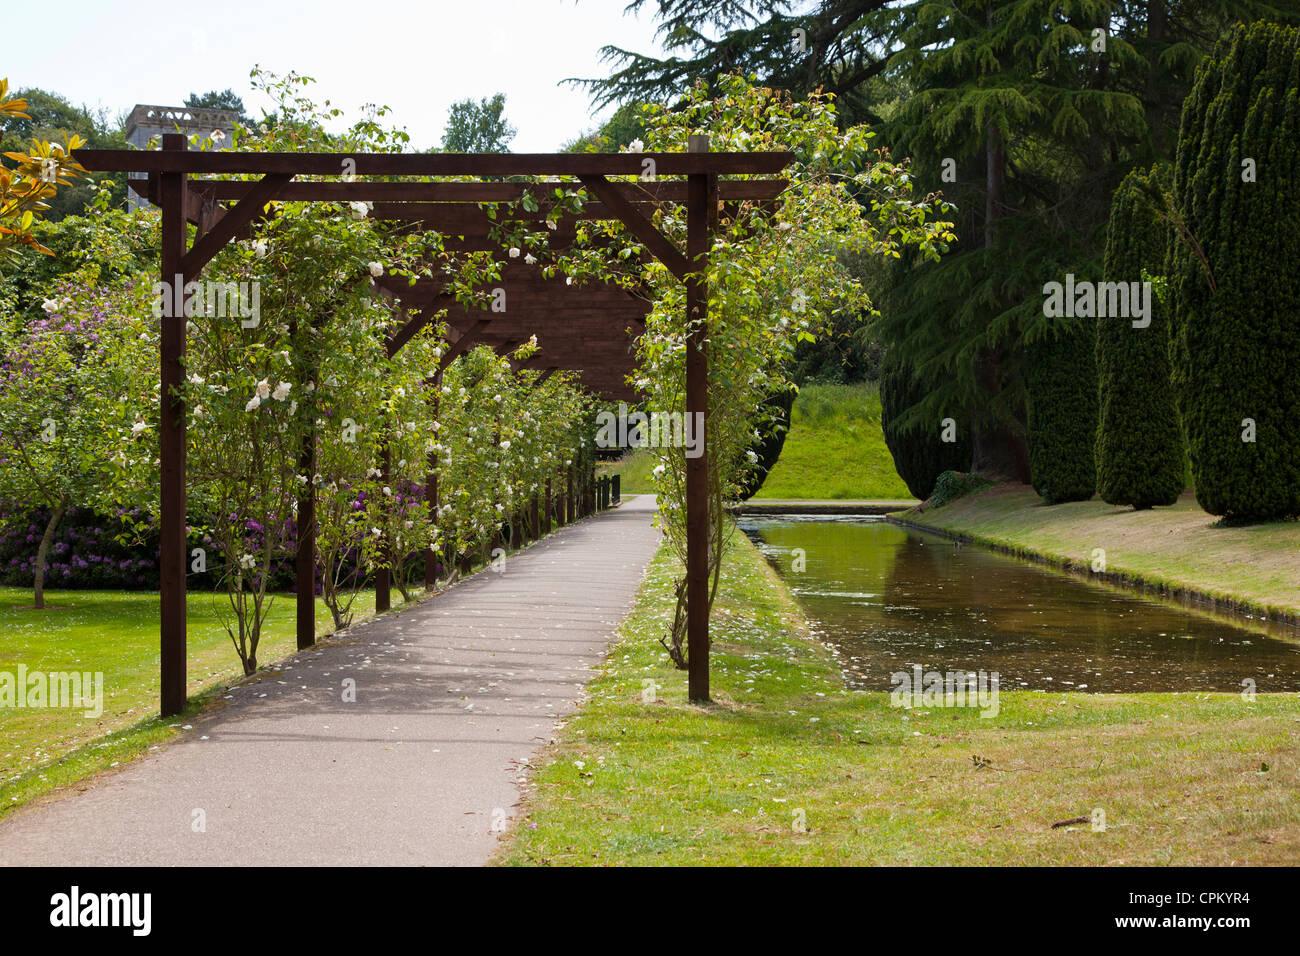 Bicton park botanical gardens, Exeter, south Devon, UK. - Stock Image